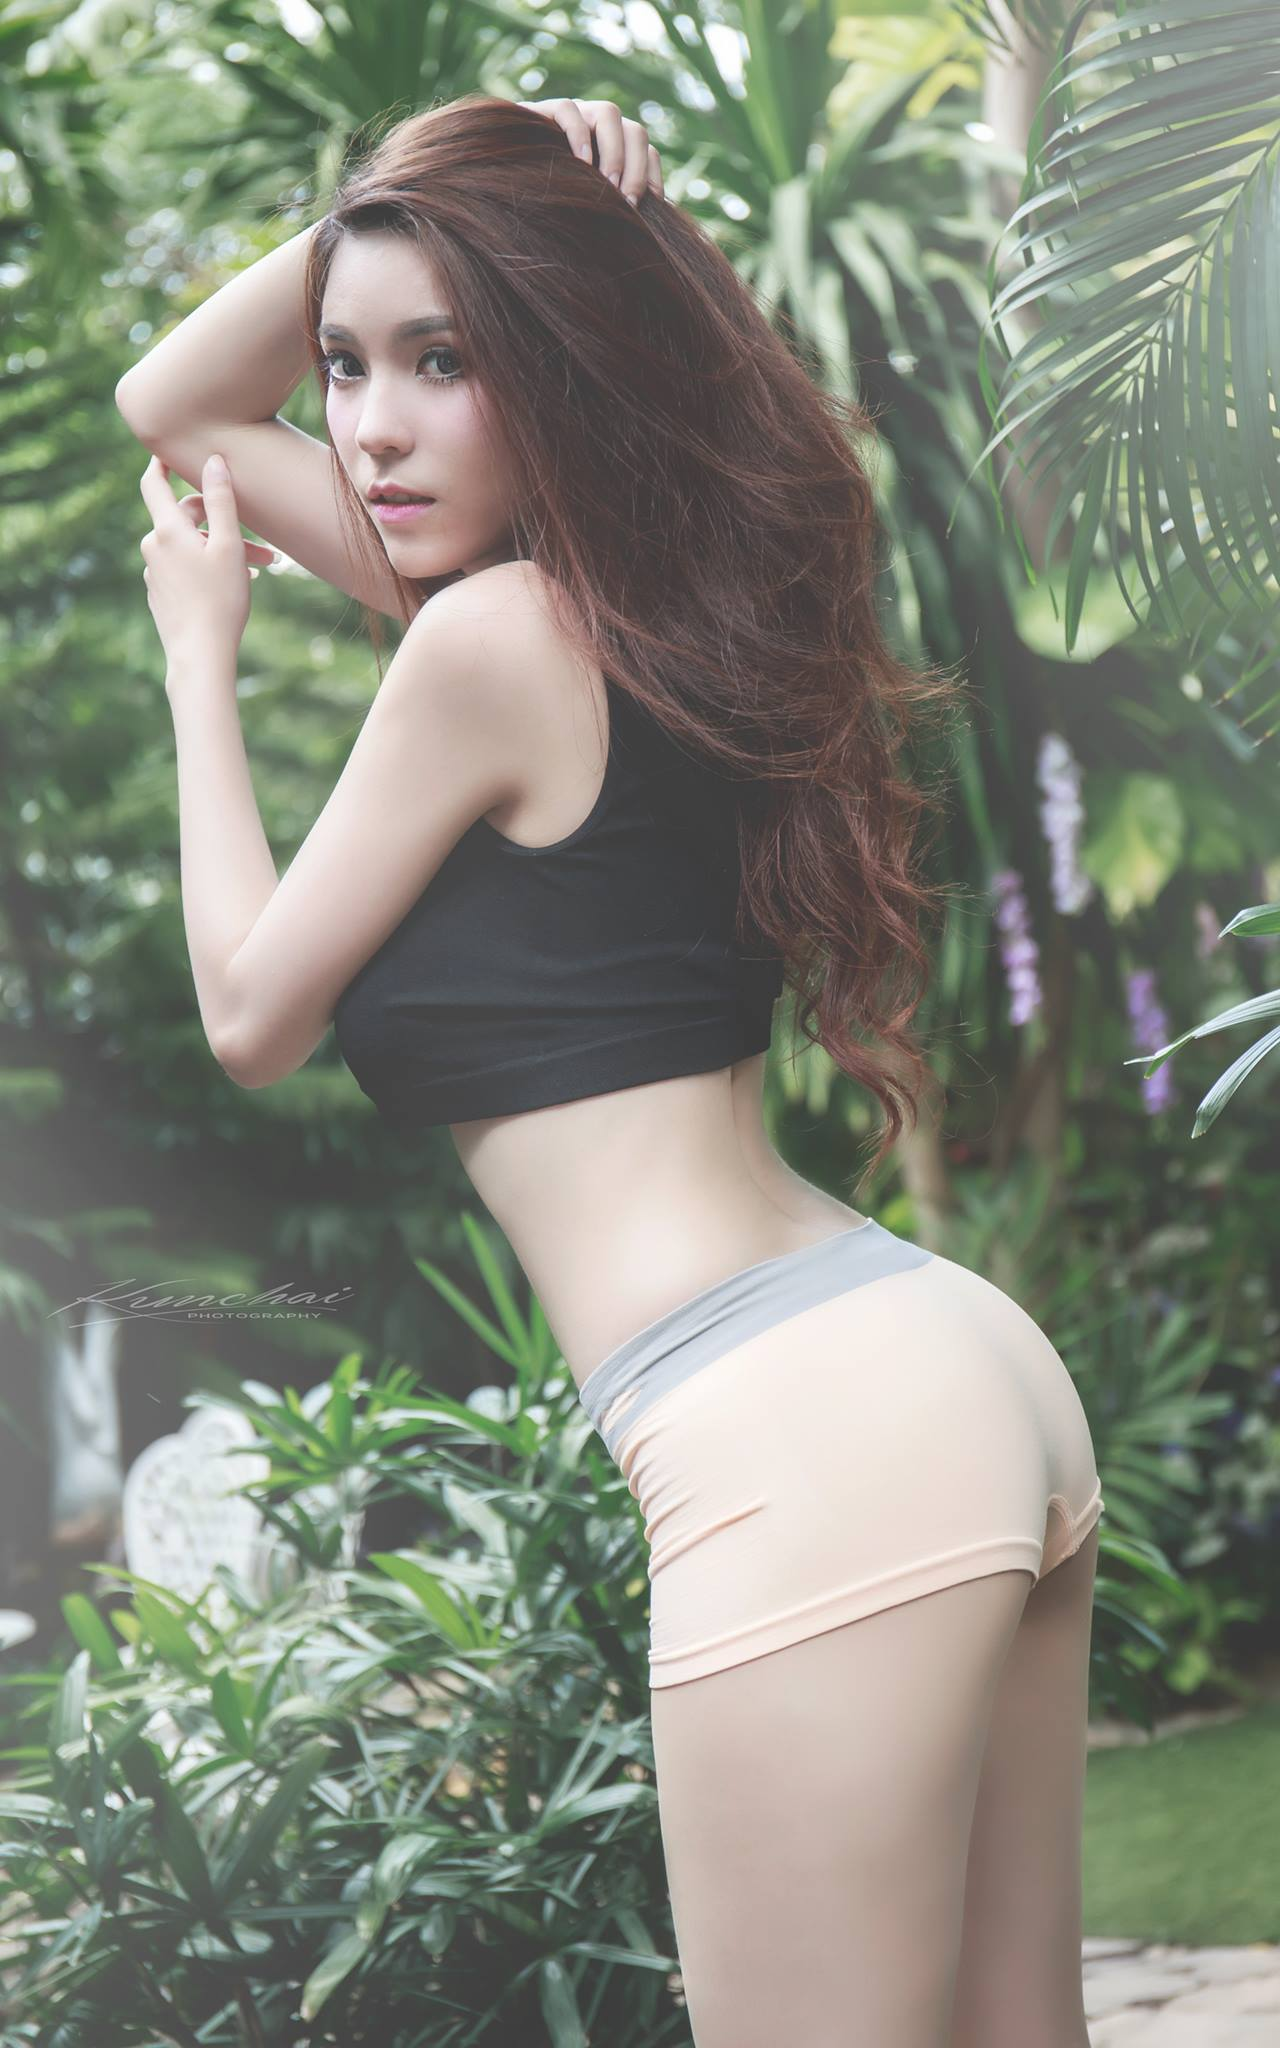 Work Out - Janet Kanokwan Saesim